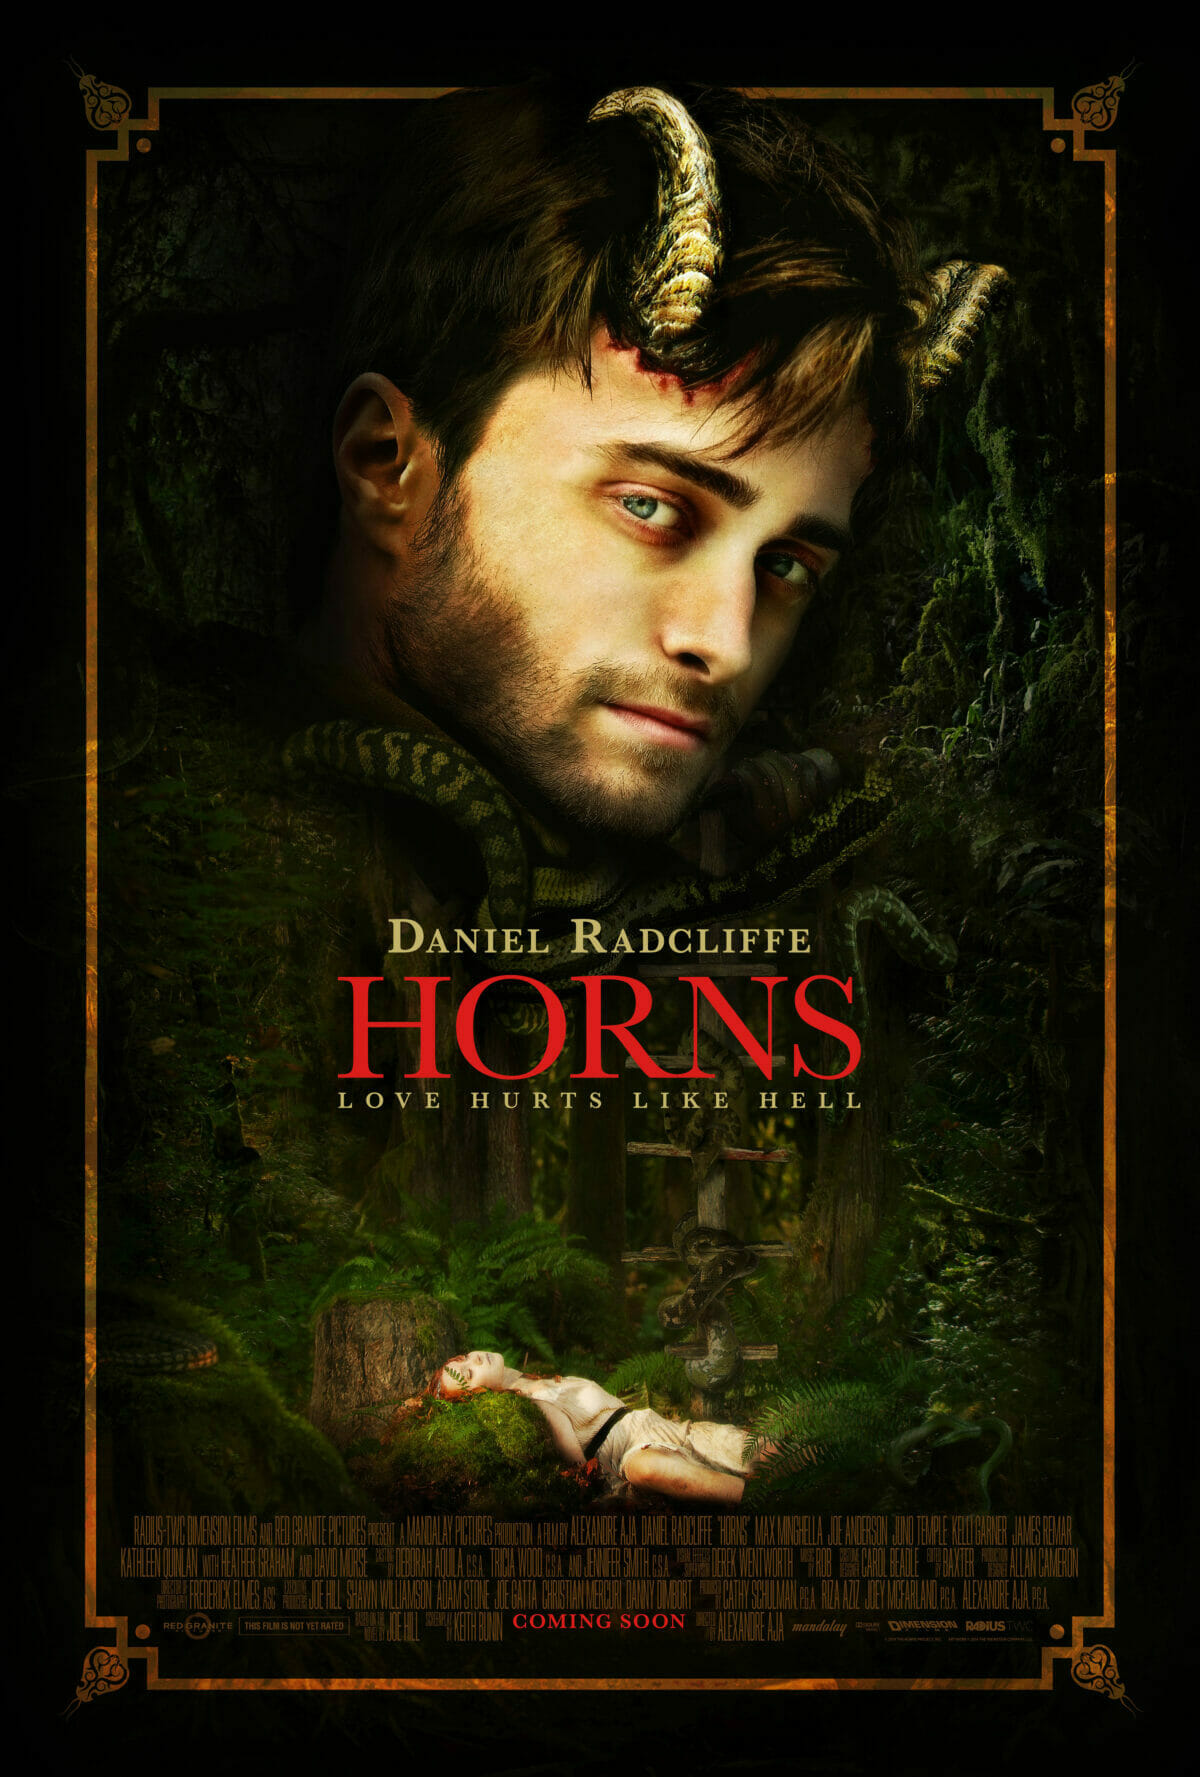 Horns-Comic-Con-poster-Daniel-Radcliffe